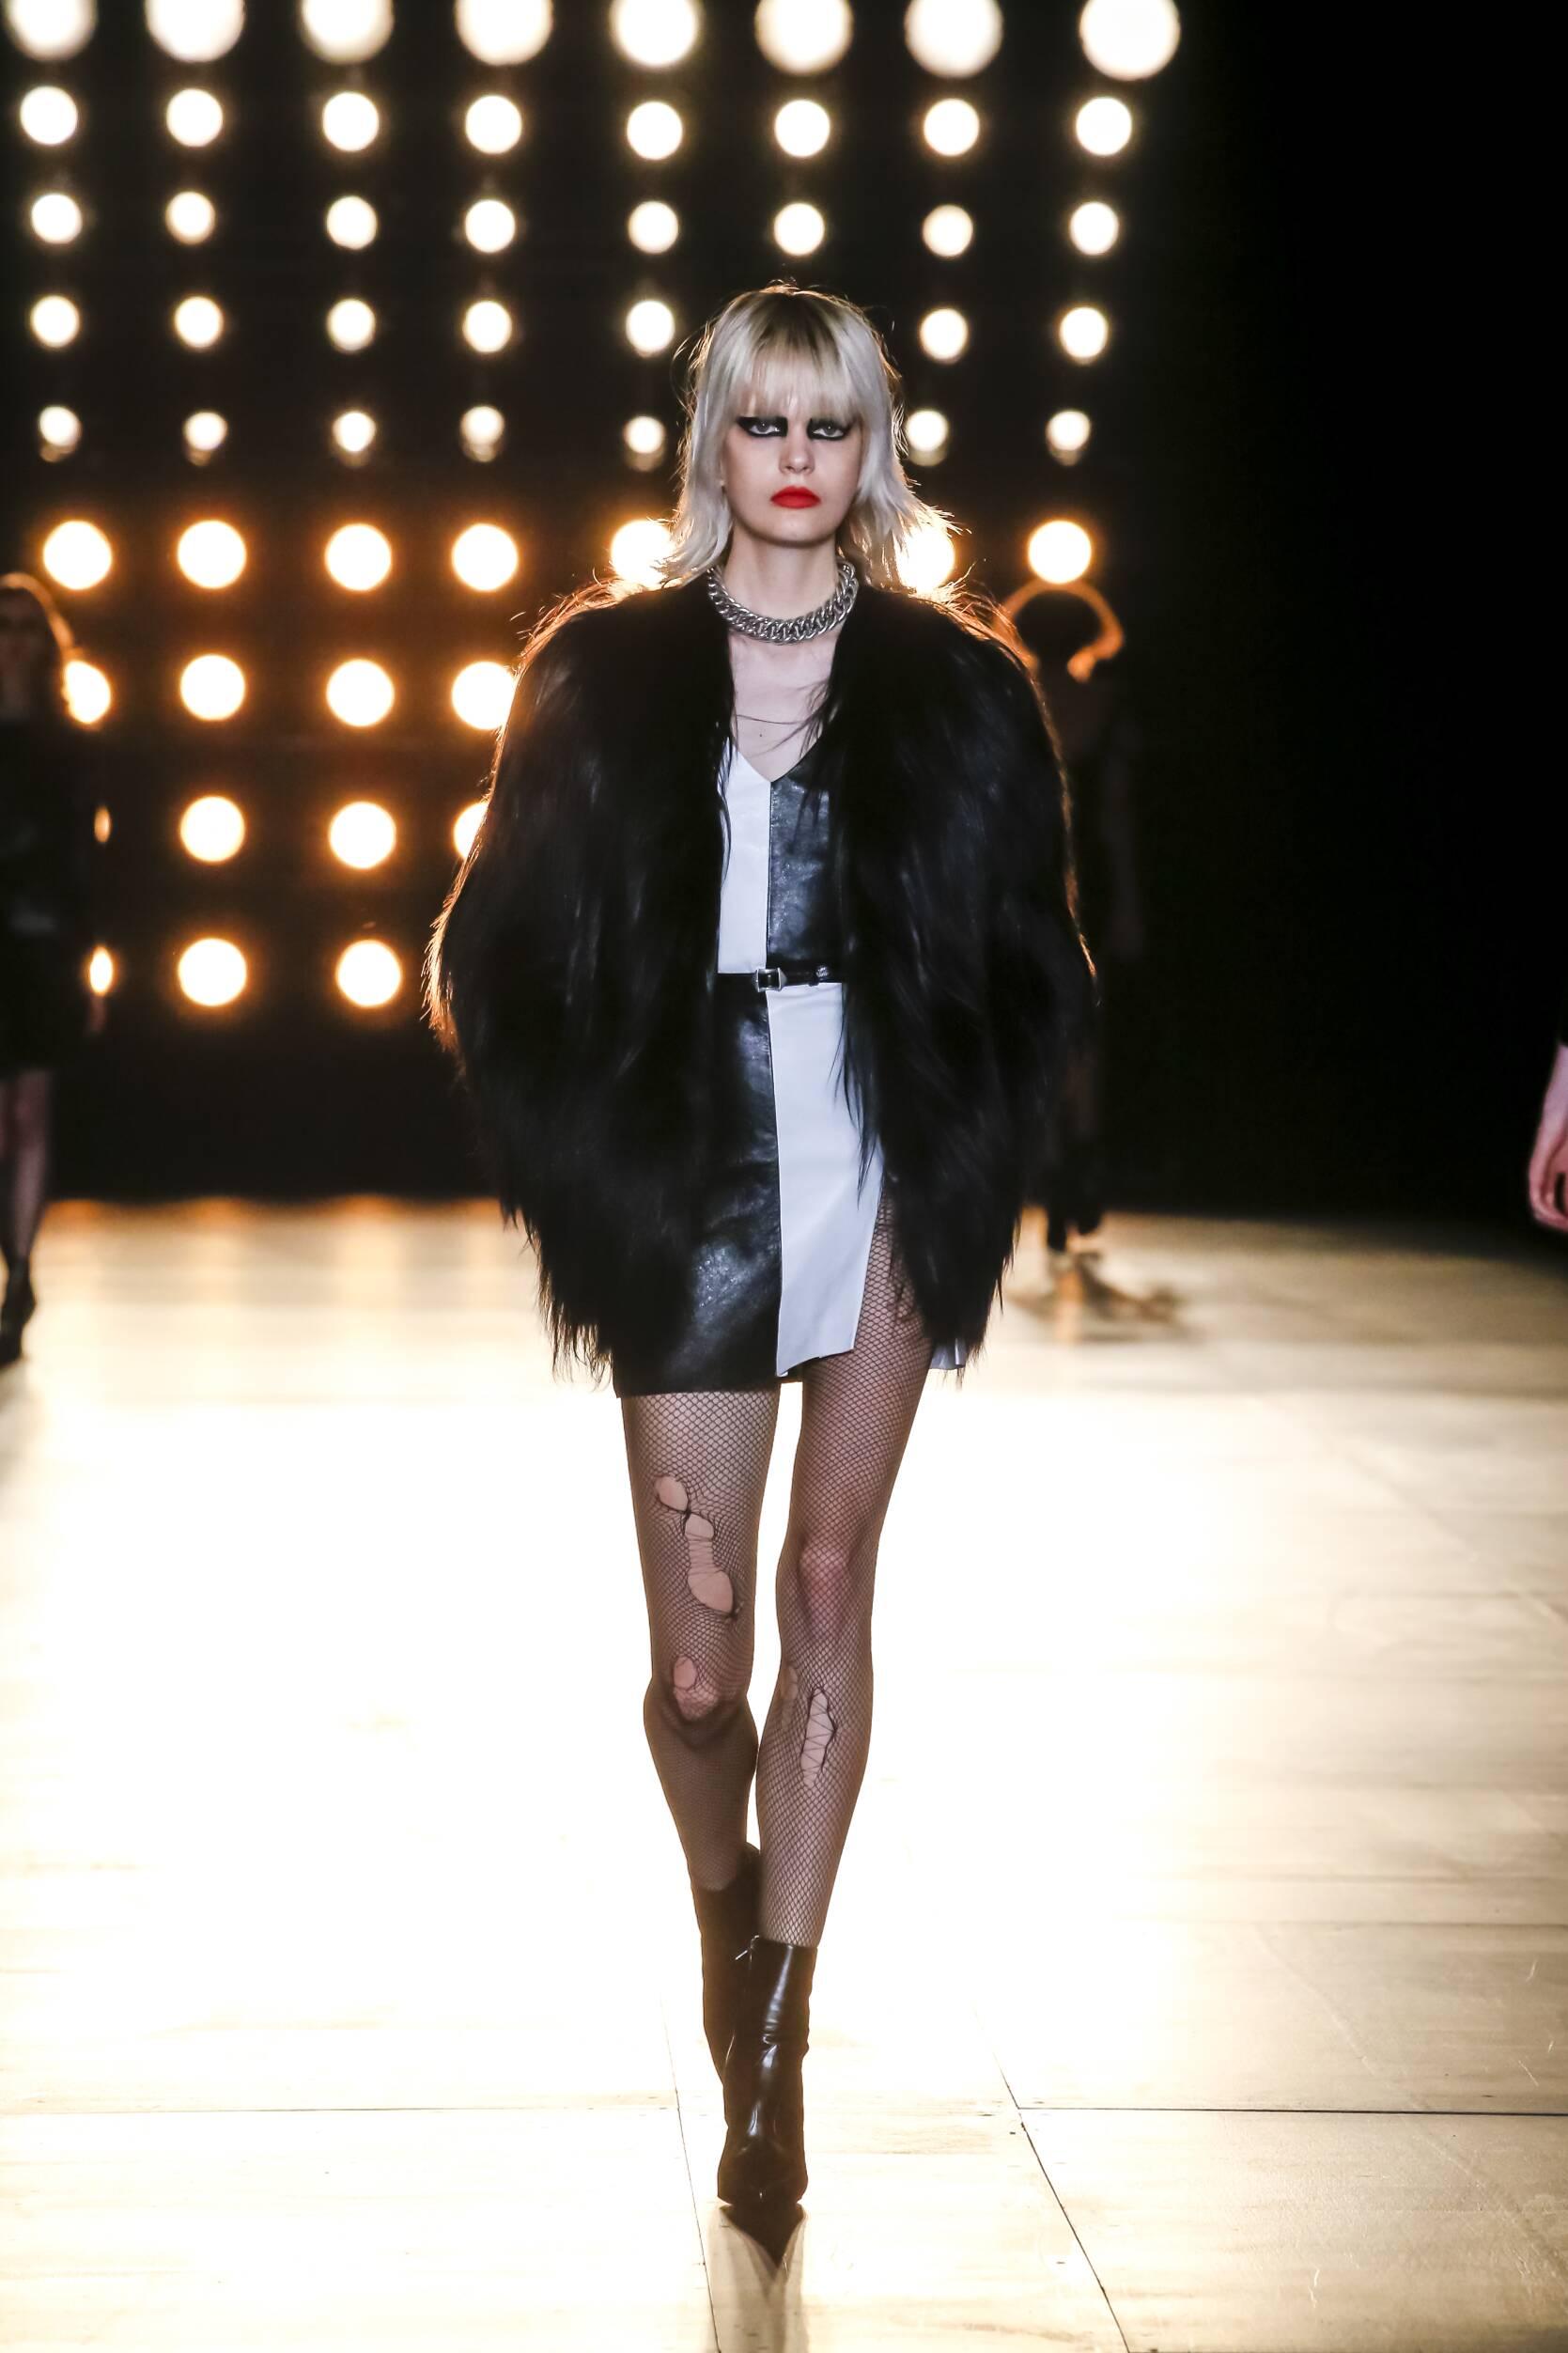 Fall Saint Laurent Collection Fashion Women Model